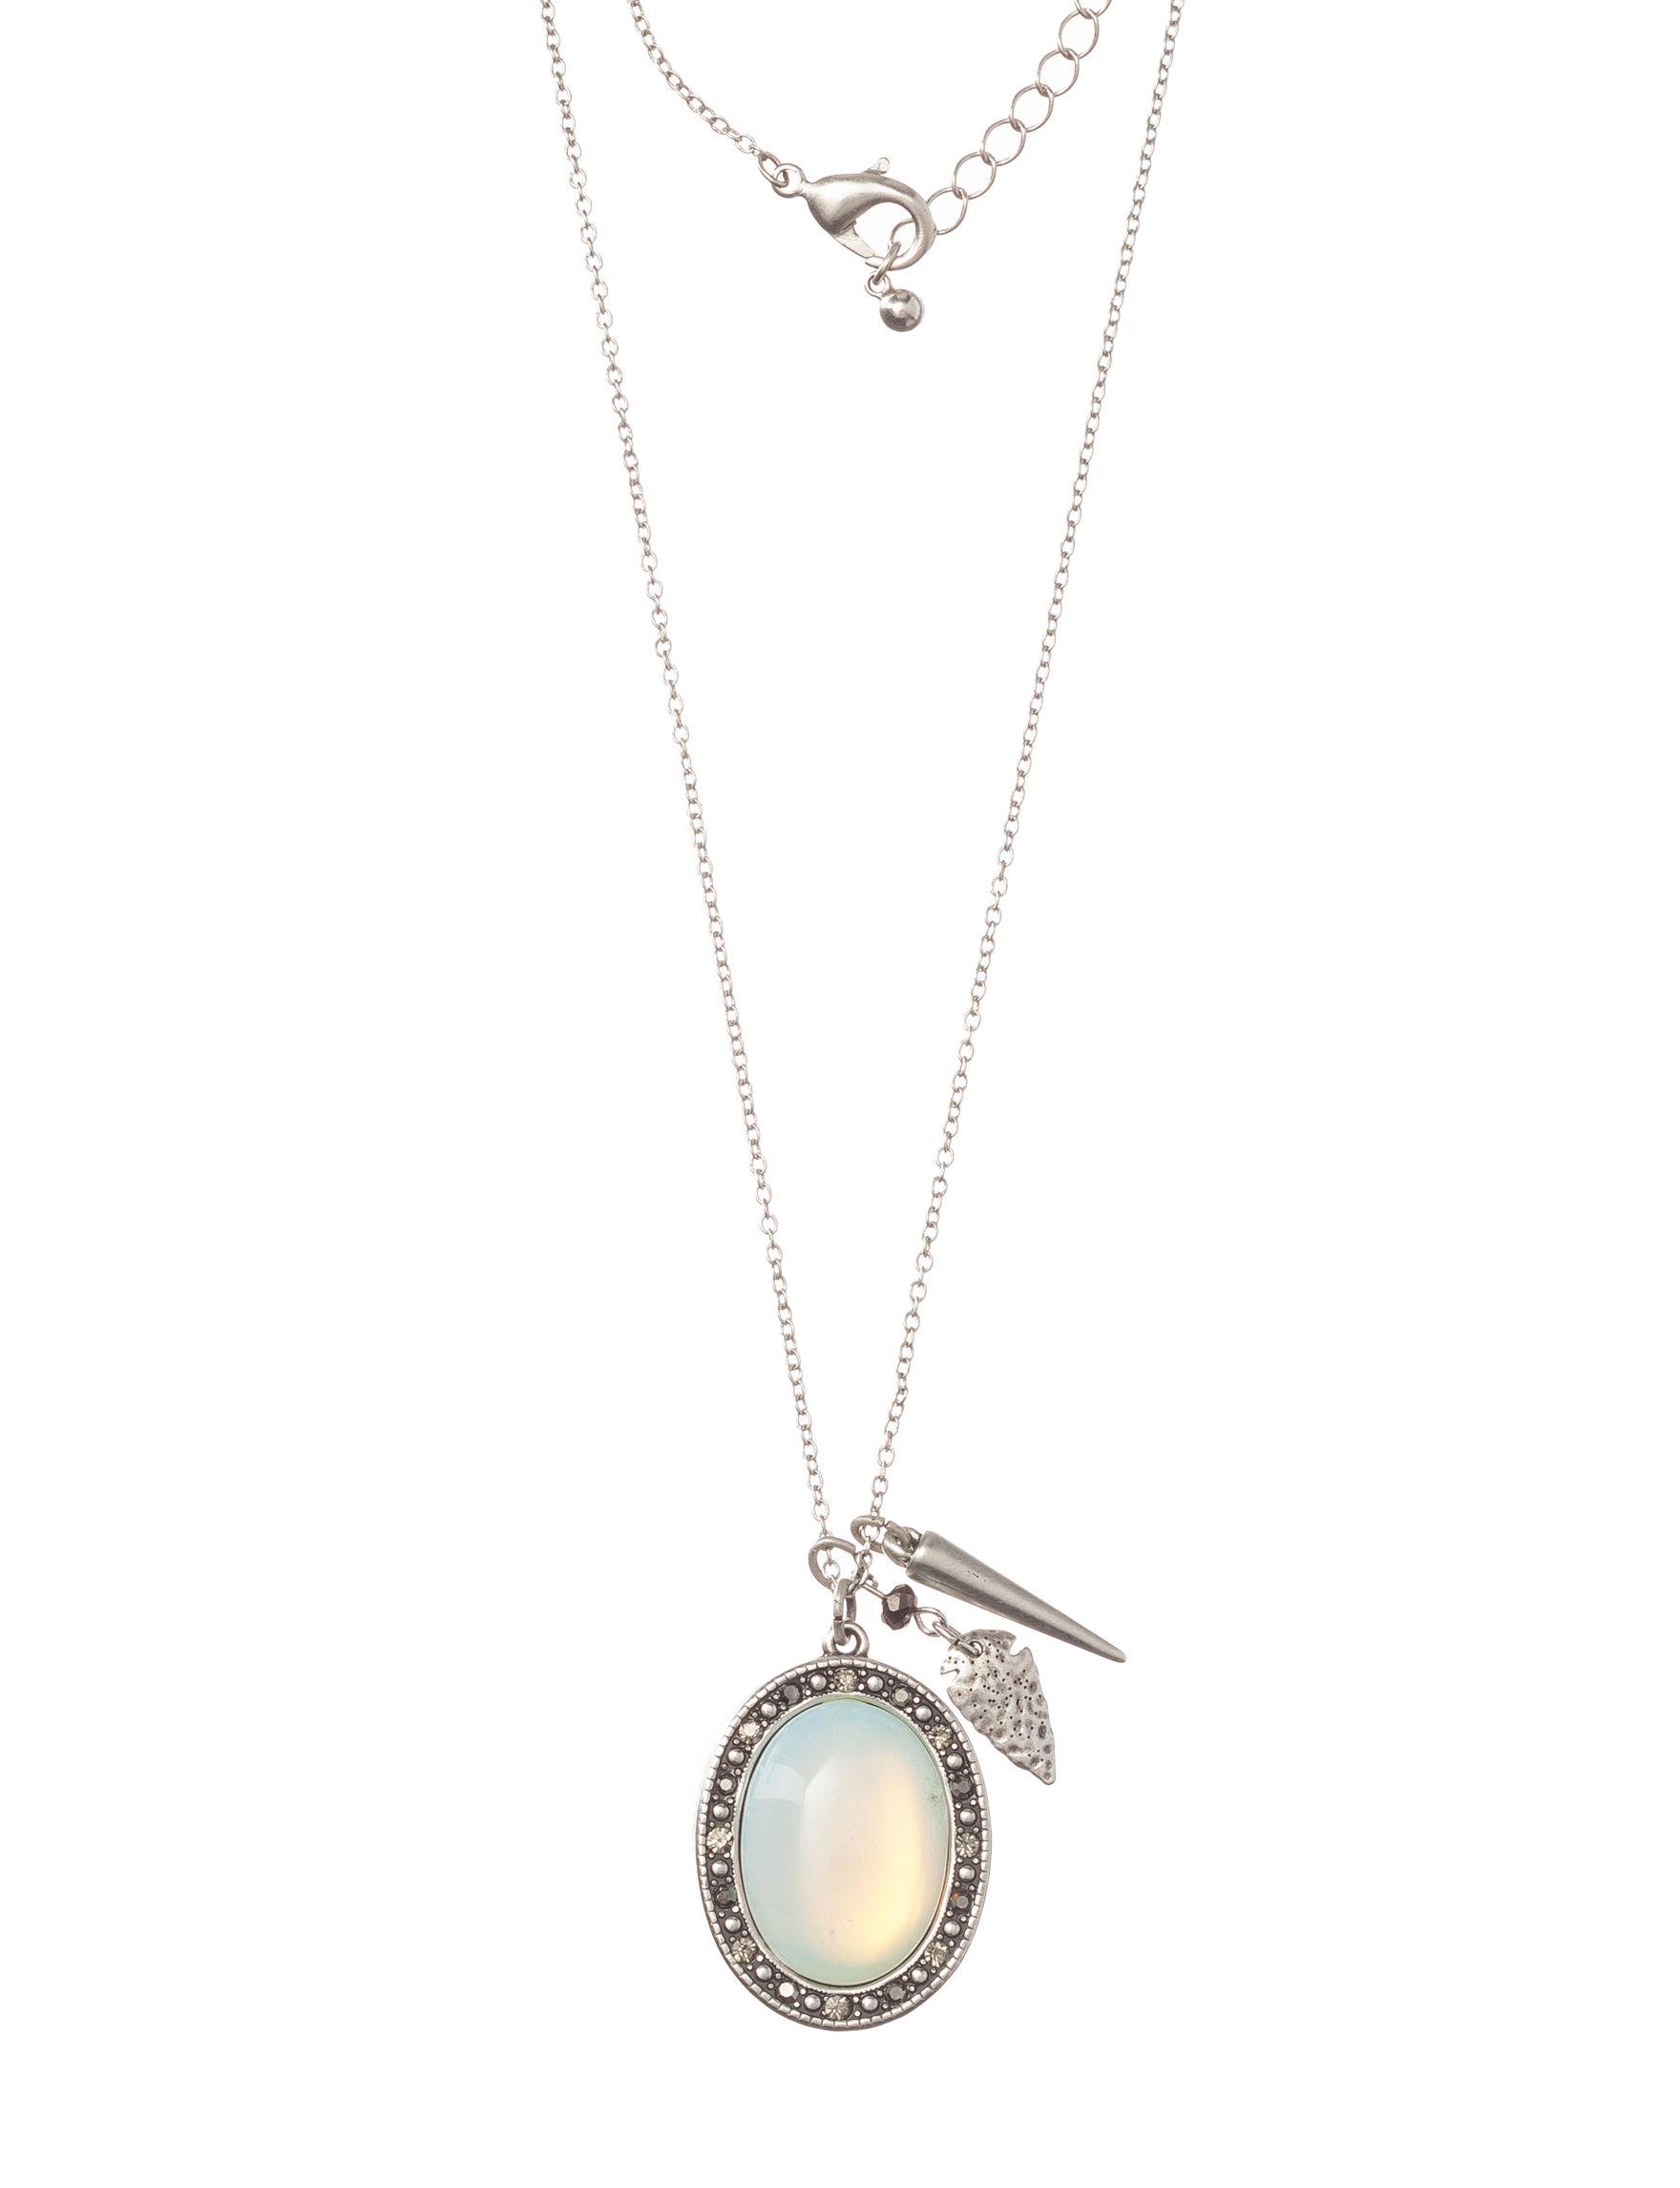 Wishful Park Multi Necklaces & Pendants Fashion Jewelry